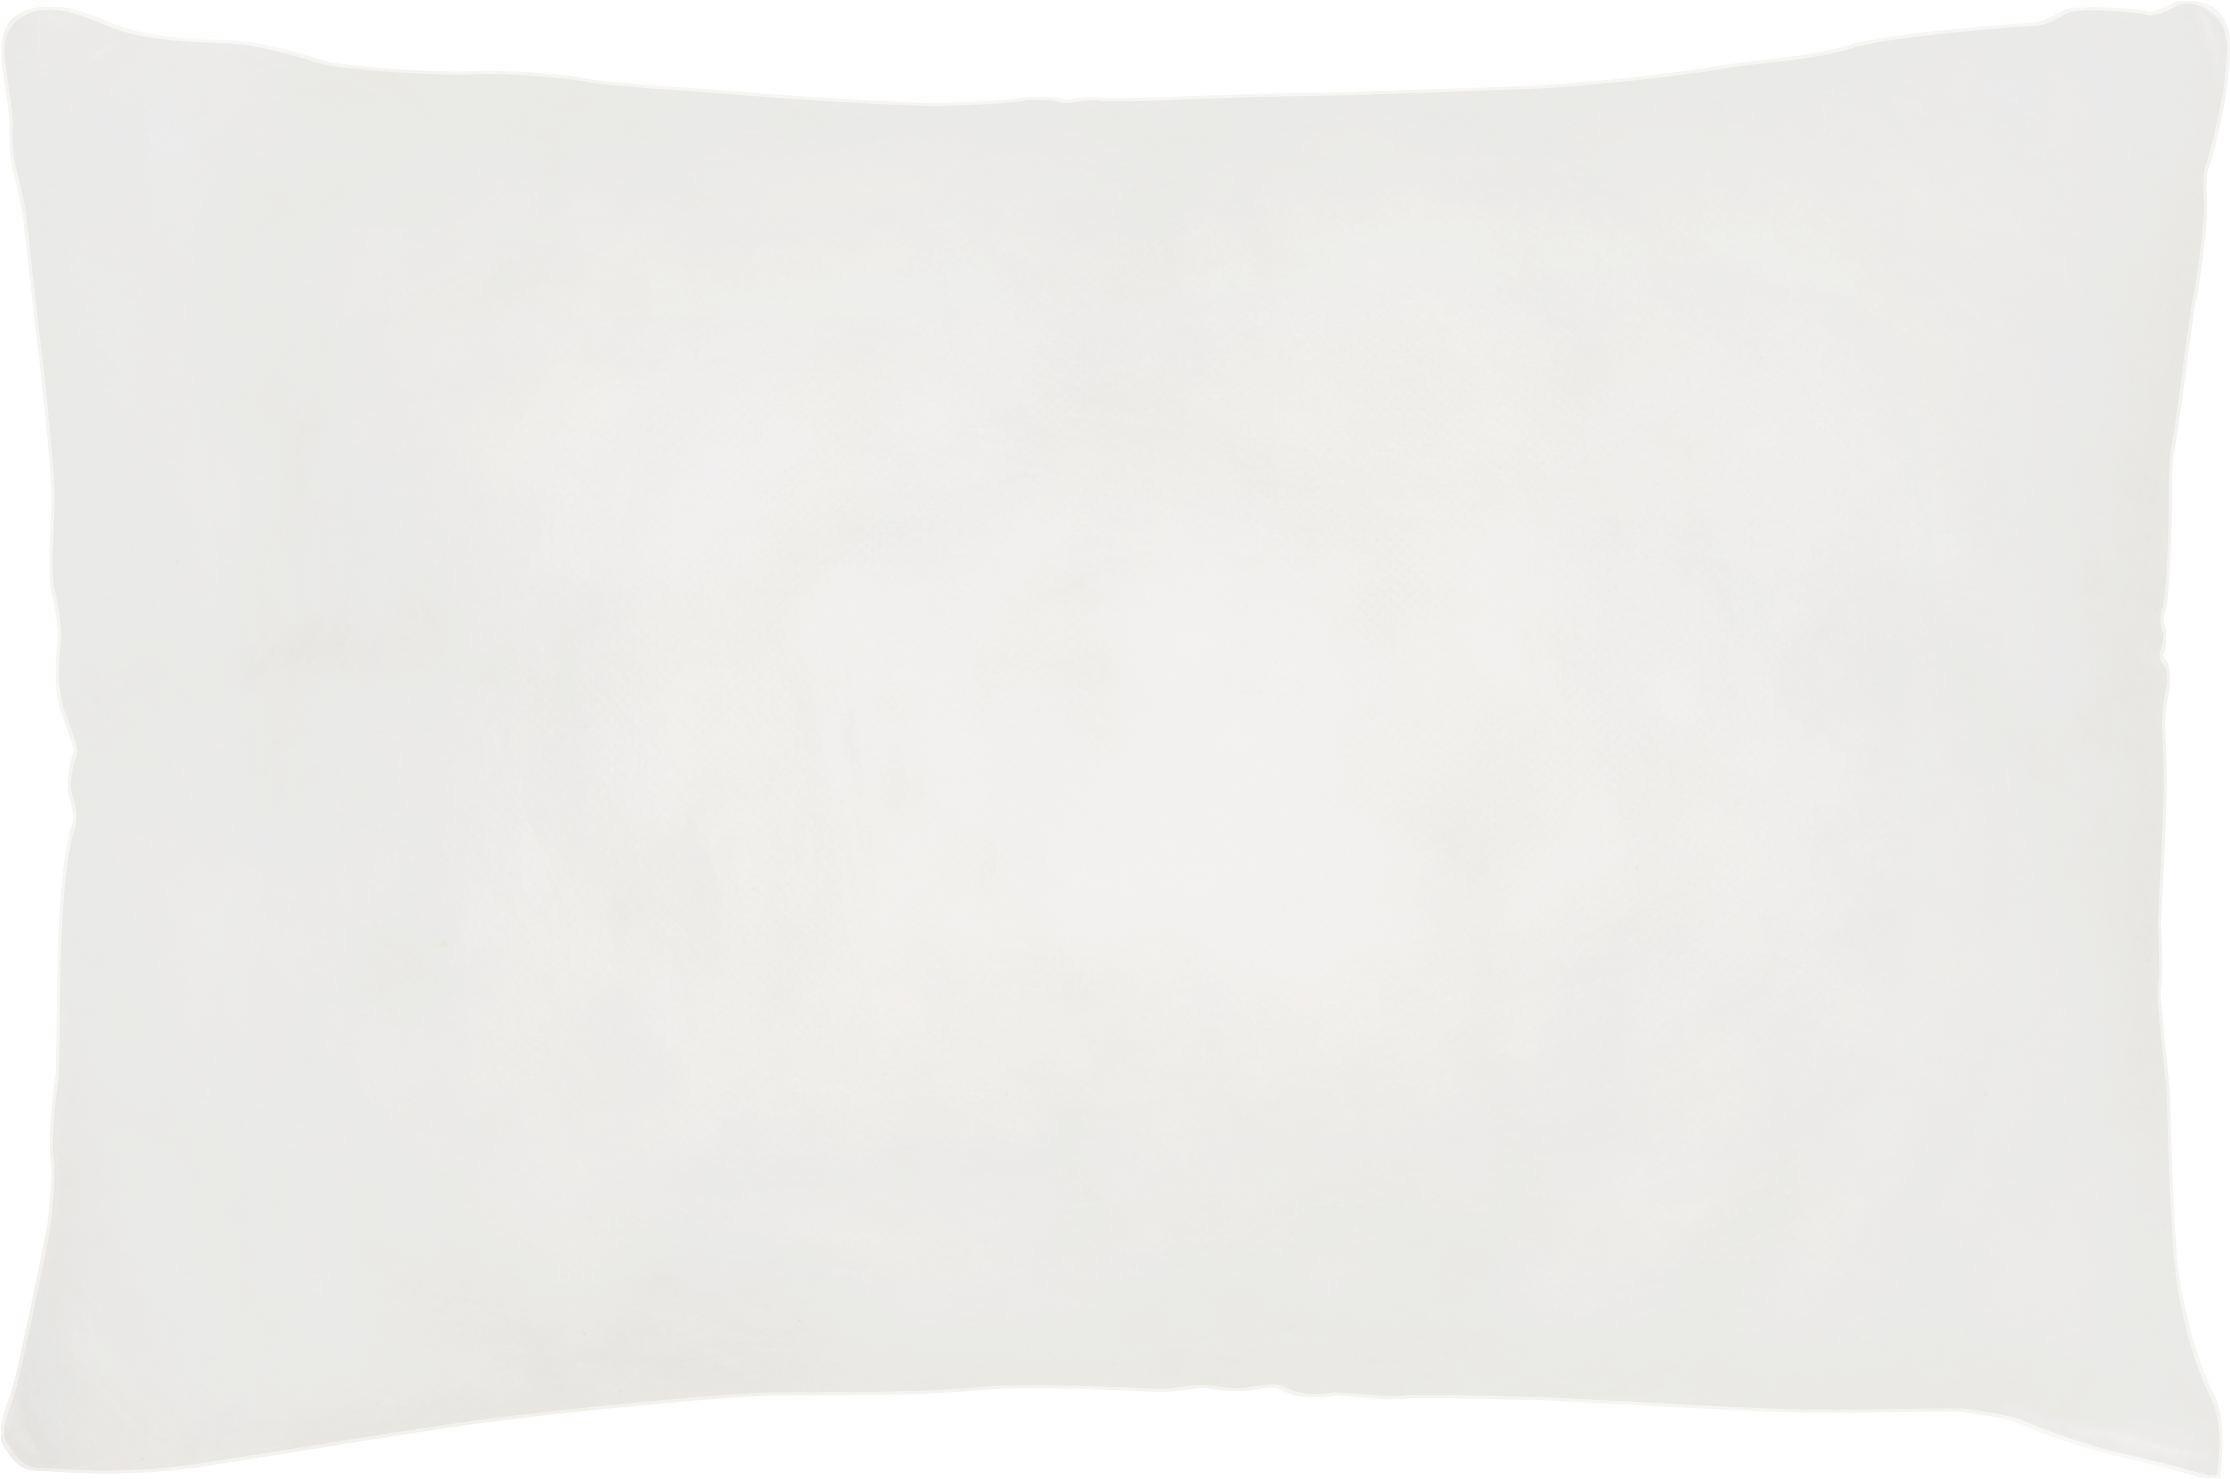 Kissenfüllung Cora in Weiß, ca. 40x40cm - Weiß (40/40cm) - MÖMAX modern living